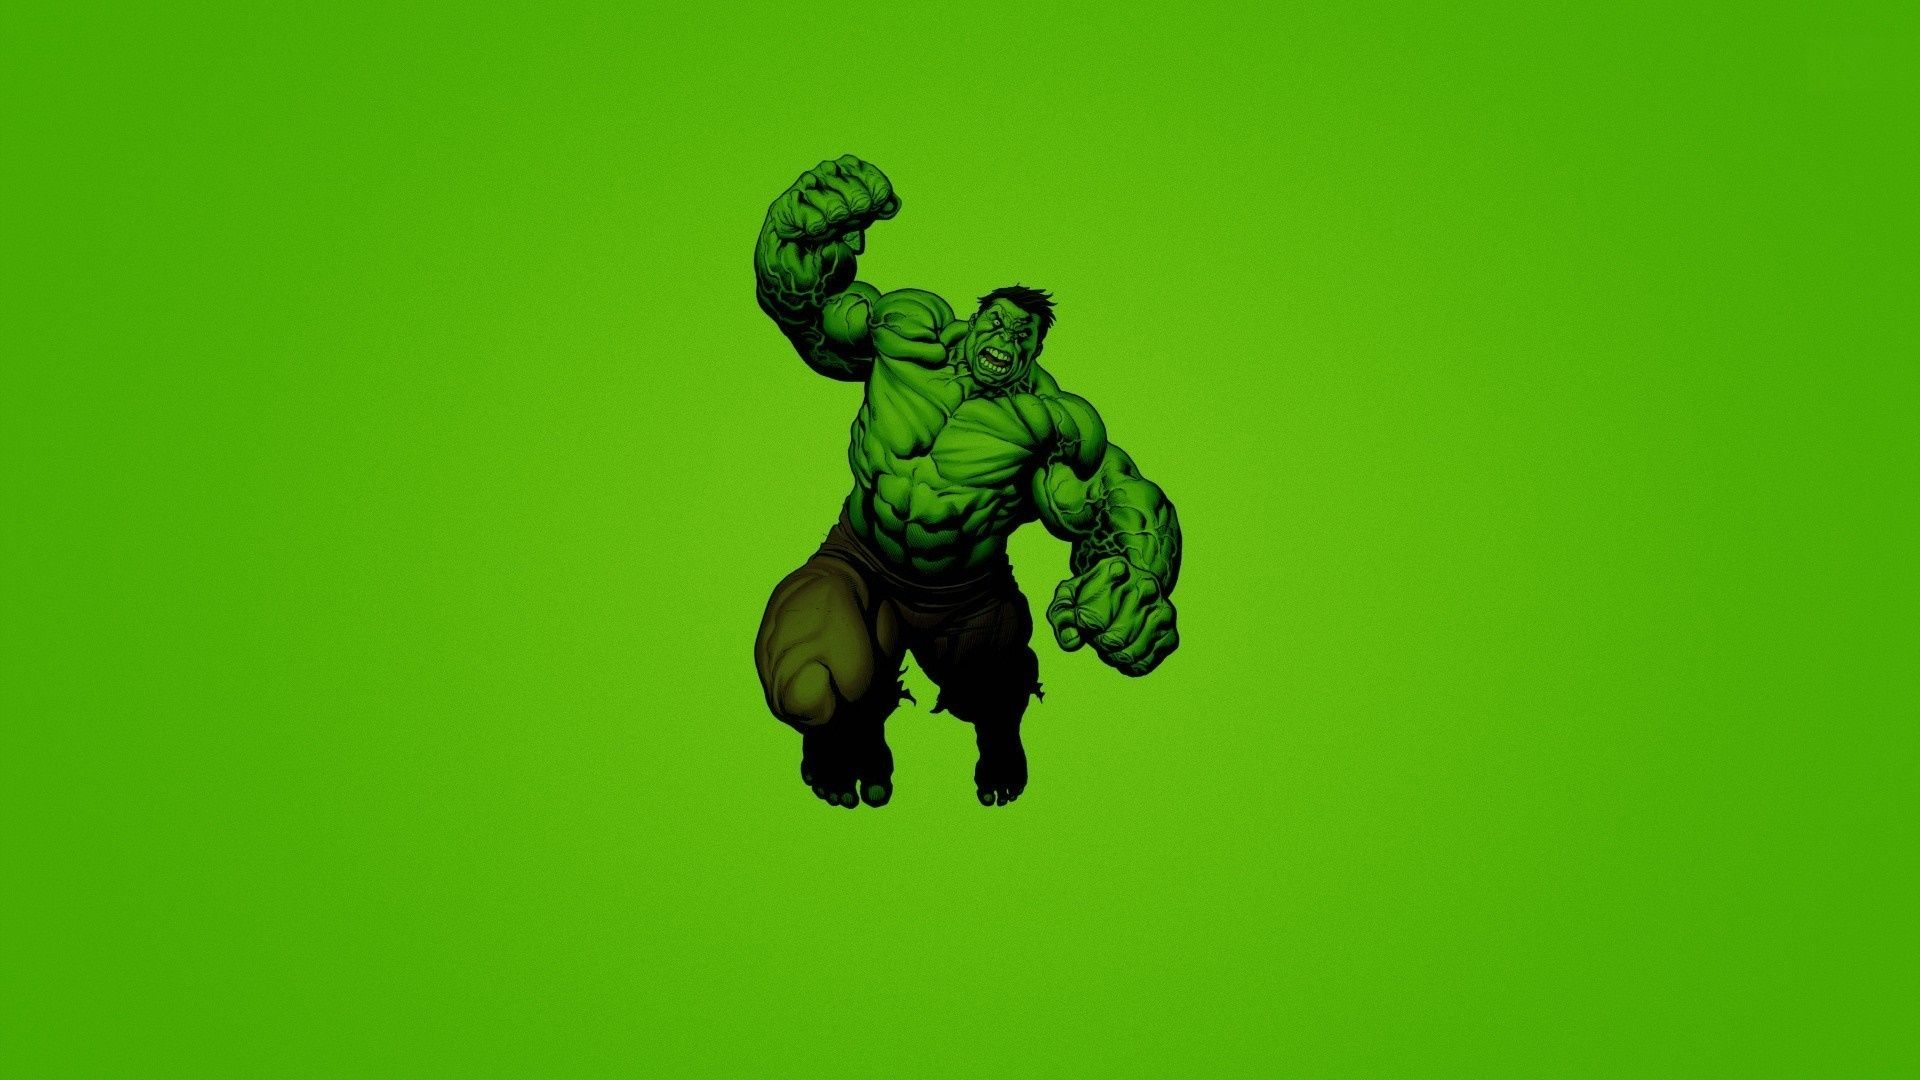 Incredible Hulk Wallpapers Hd Backgrounds Download The Incredibles Incredible Hulk Hd Backgrounds